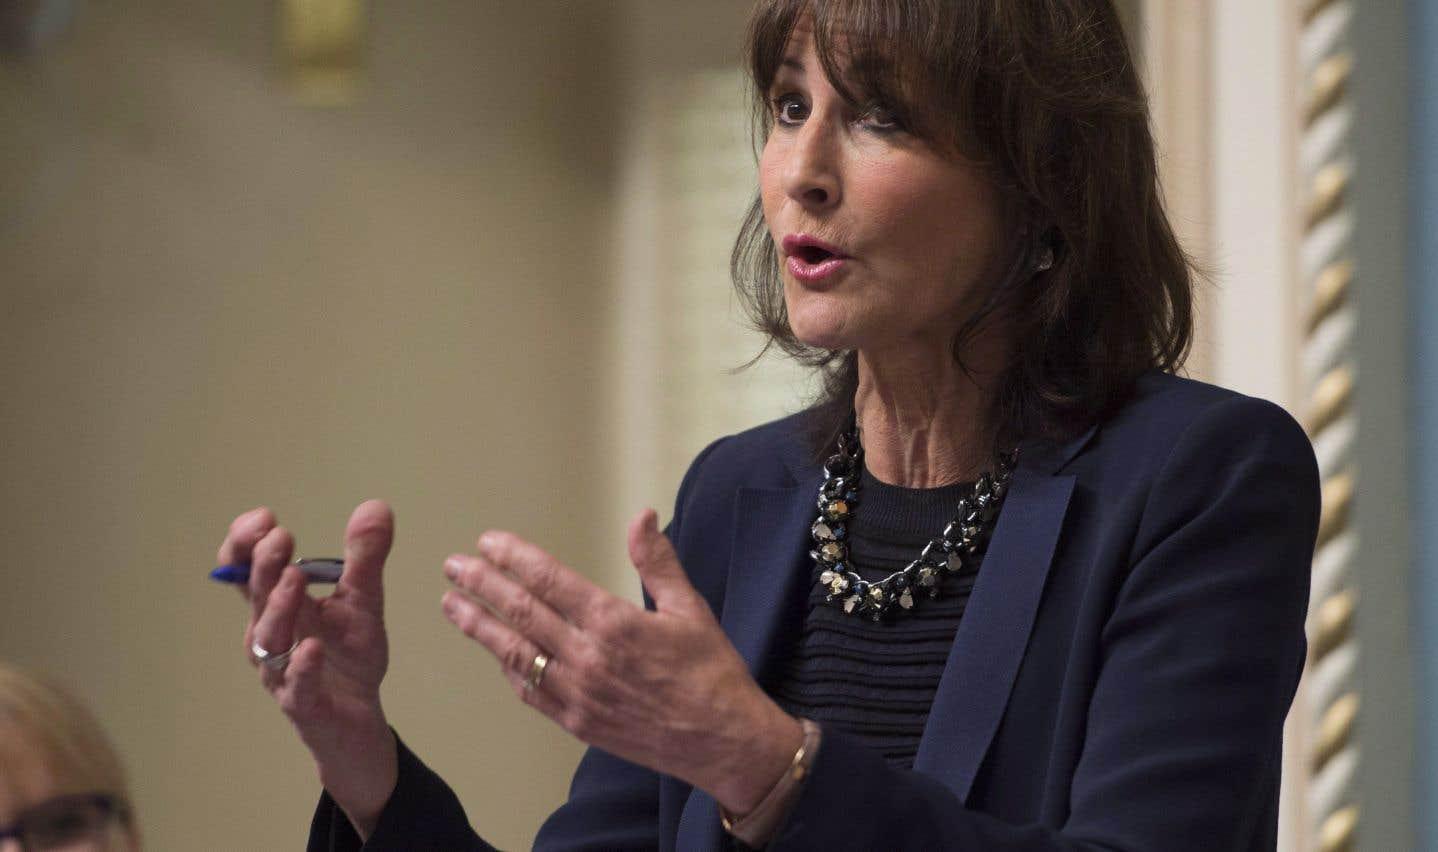 Québec veut resserrer l'accès à l'information